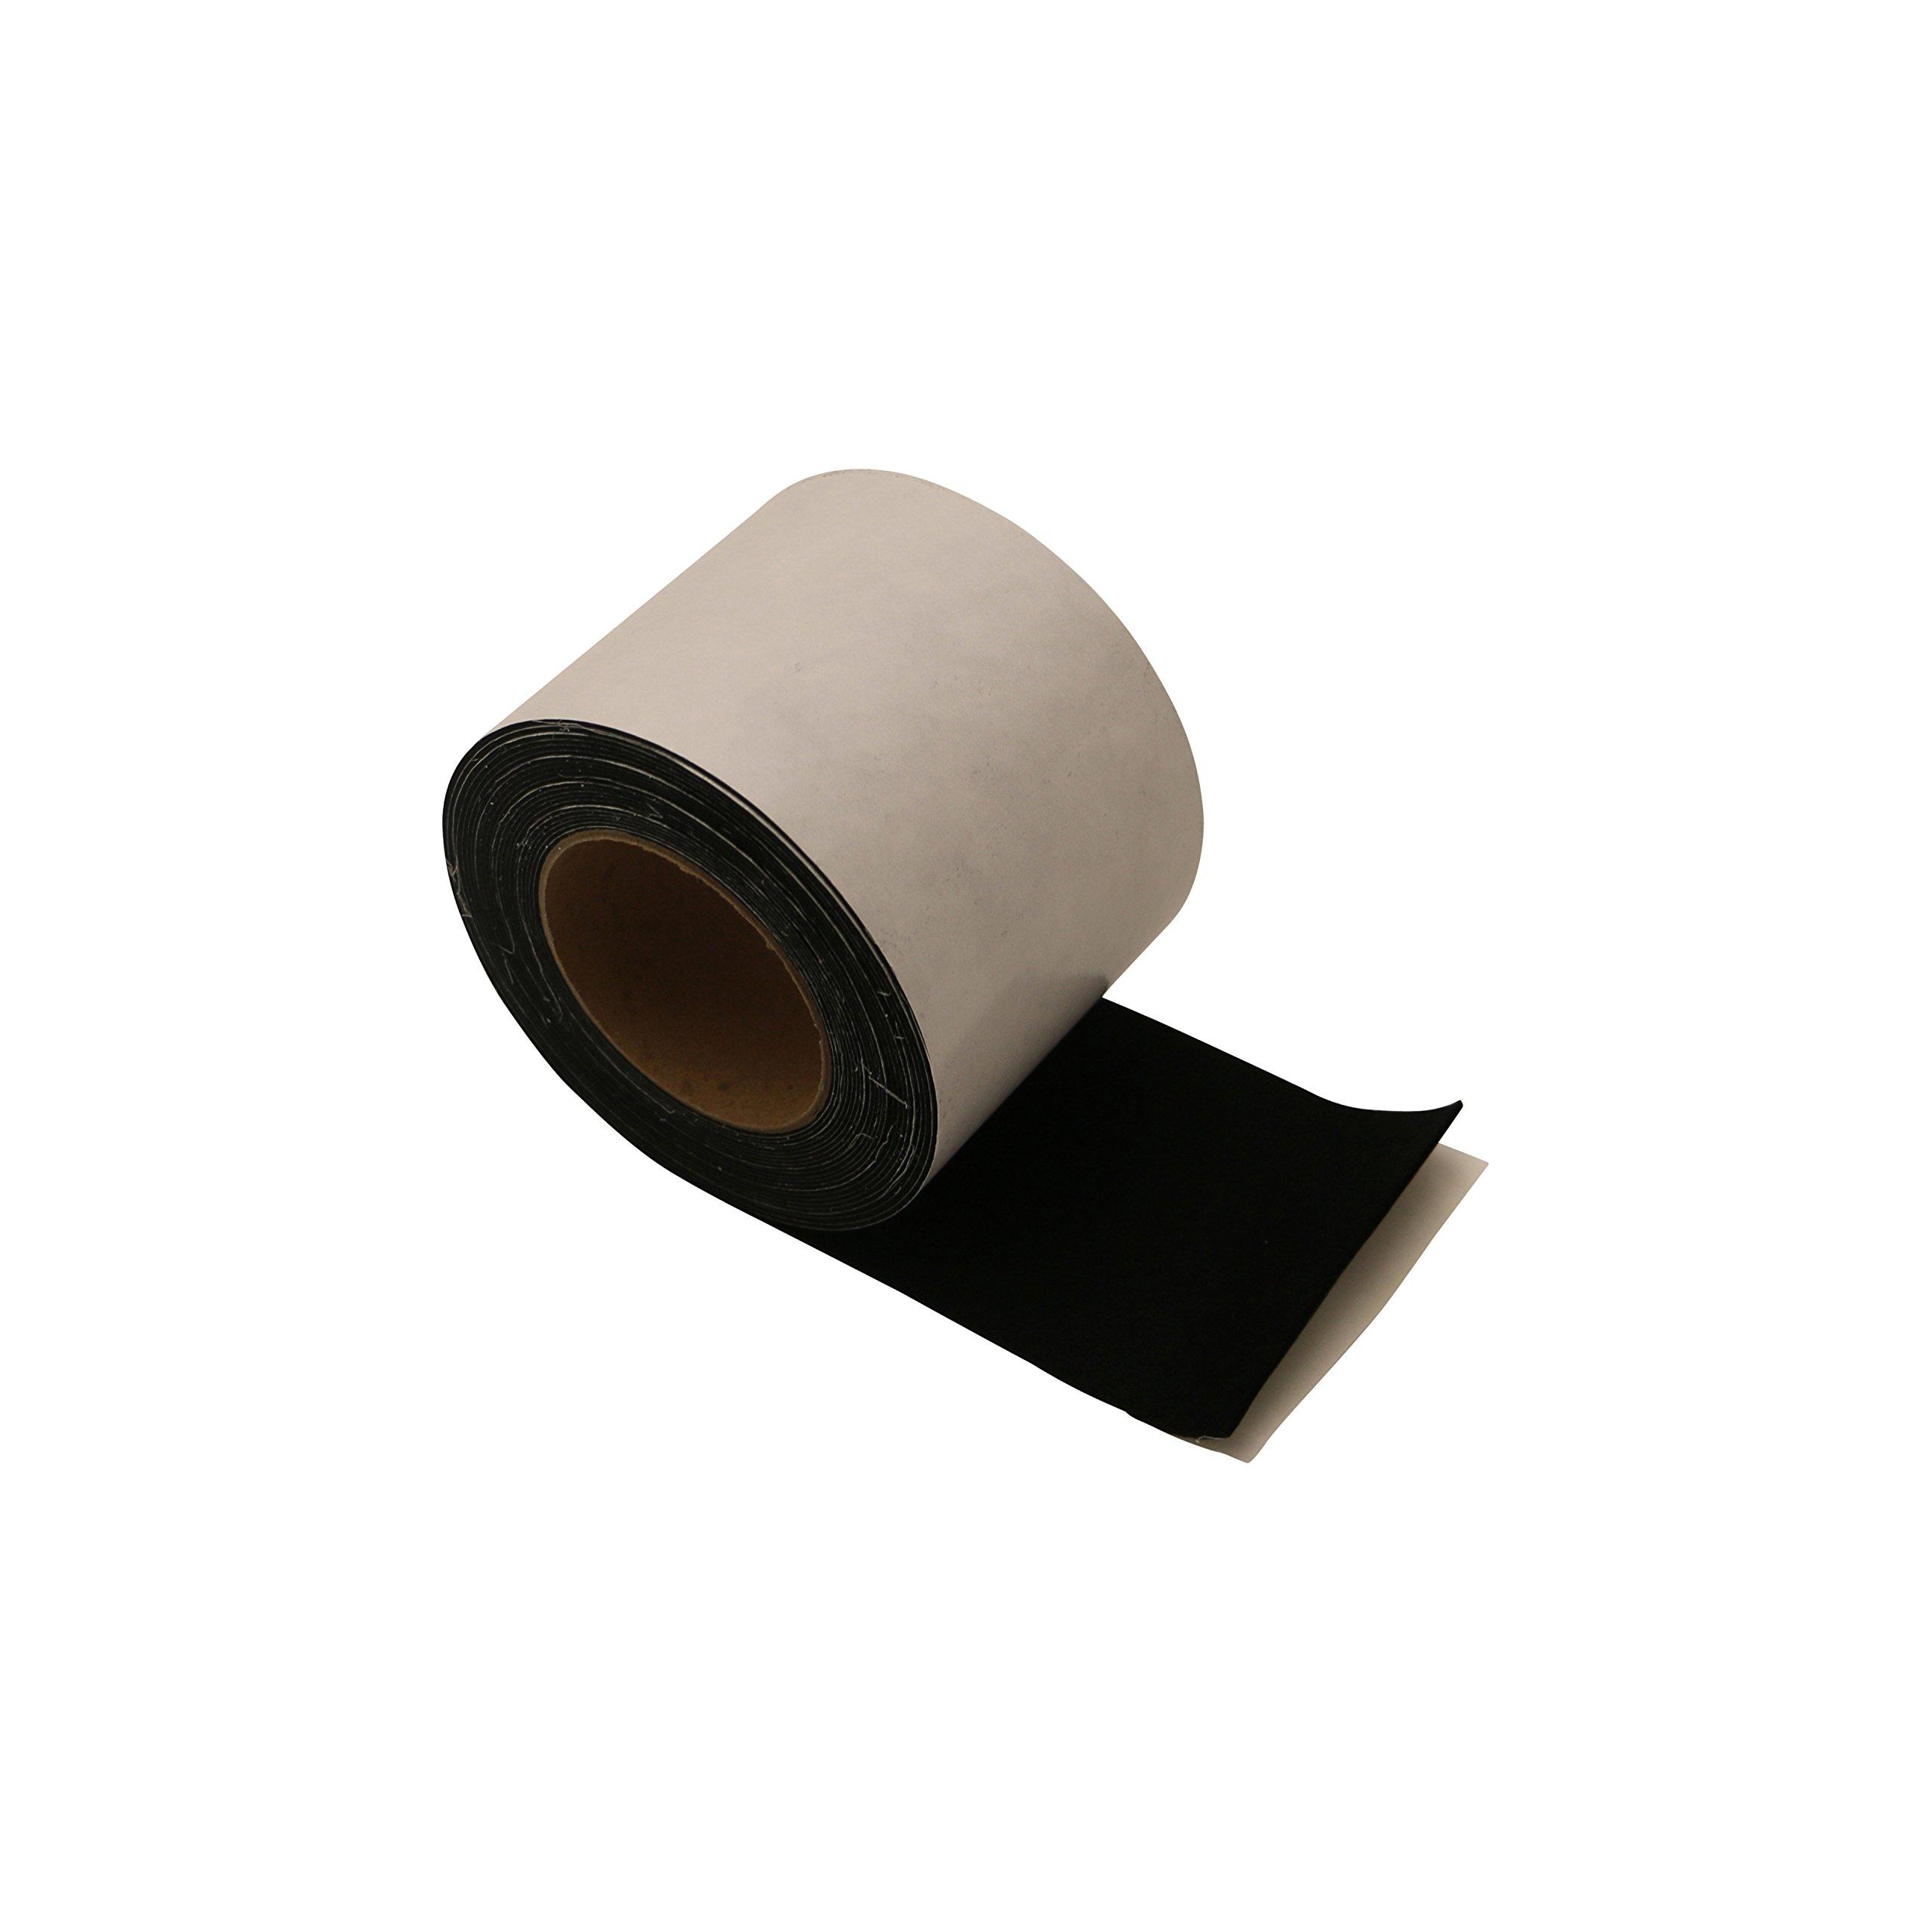 J.V. Converting ACF-06/BLK4833 JVCC ACF-06 Acrylic Craft Felt Tape: 4'' x 25 ft, Black